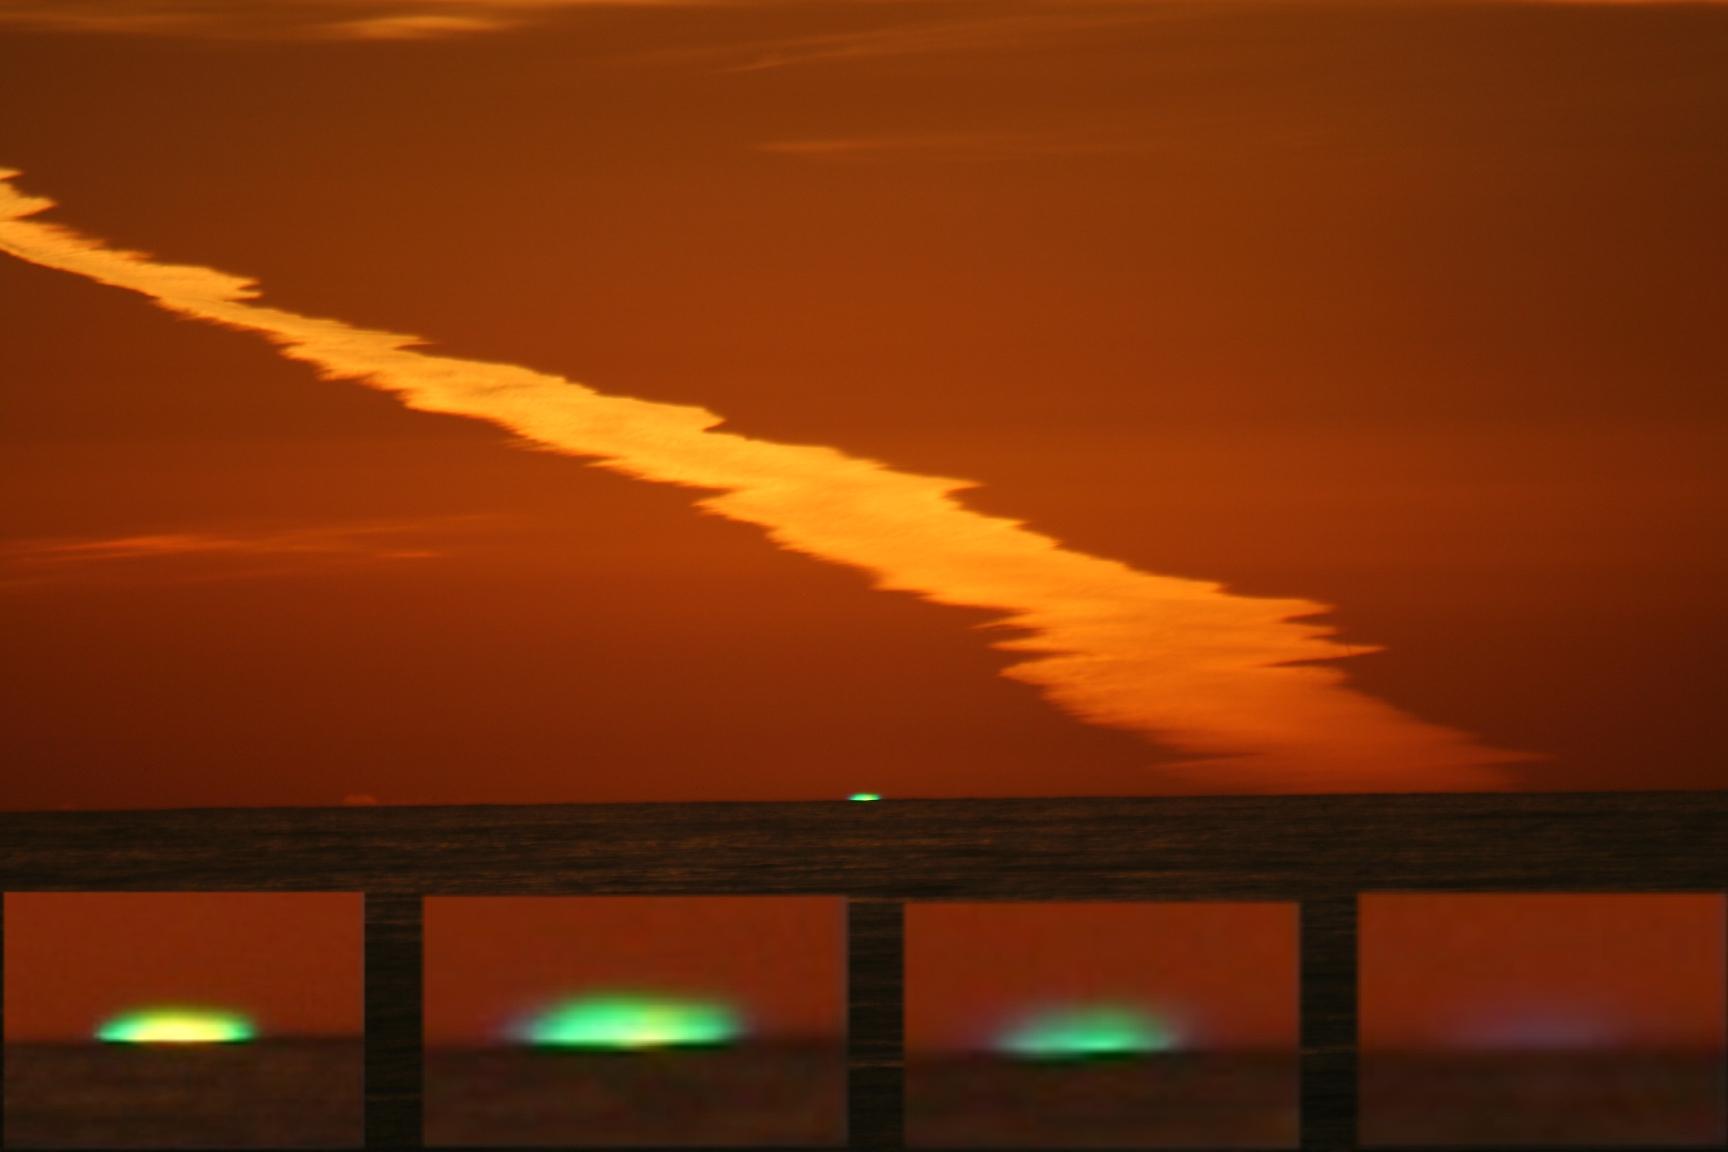 Green Flash at sunset. Image byBrocken Inaglory, via wikipedia.